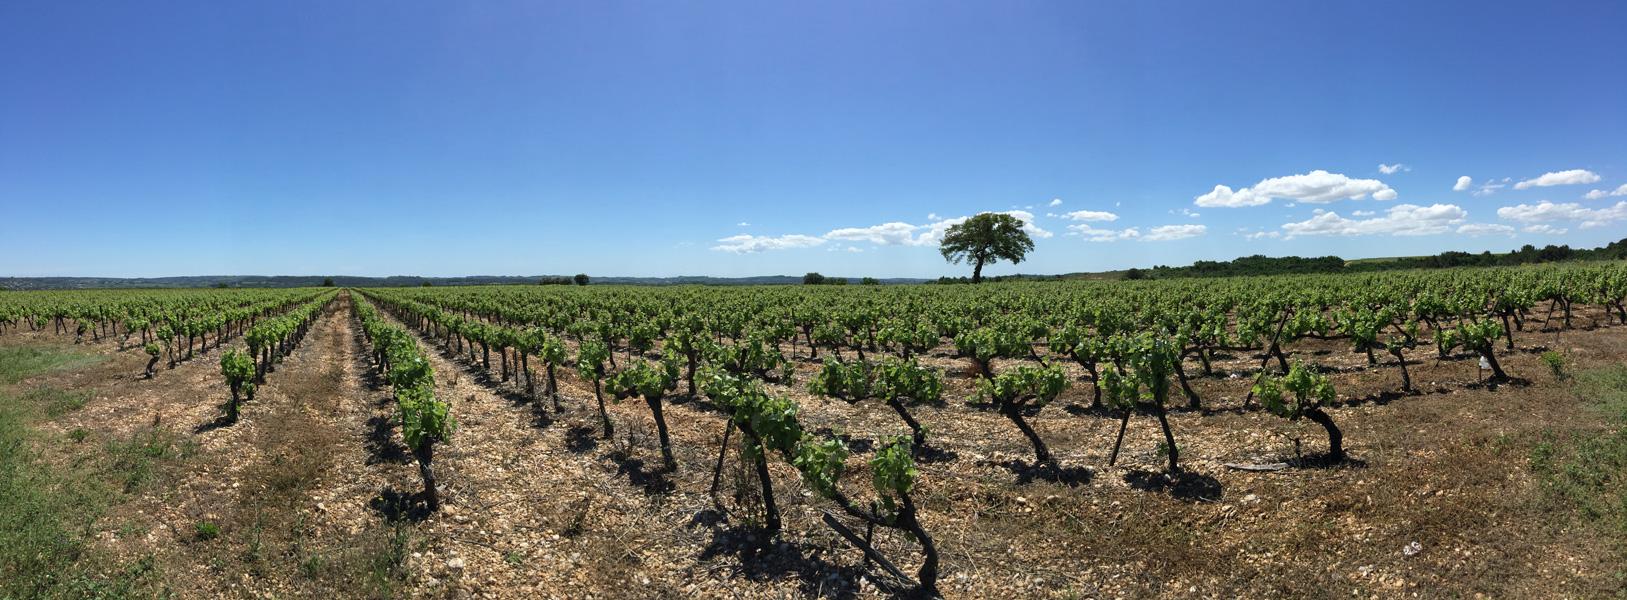 Vineyards near Caux, Languedoc